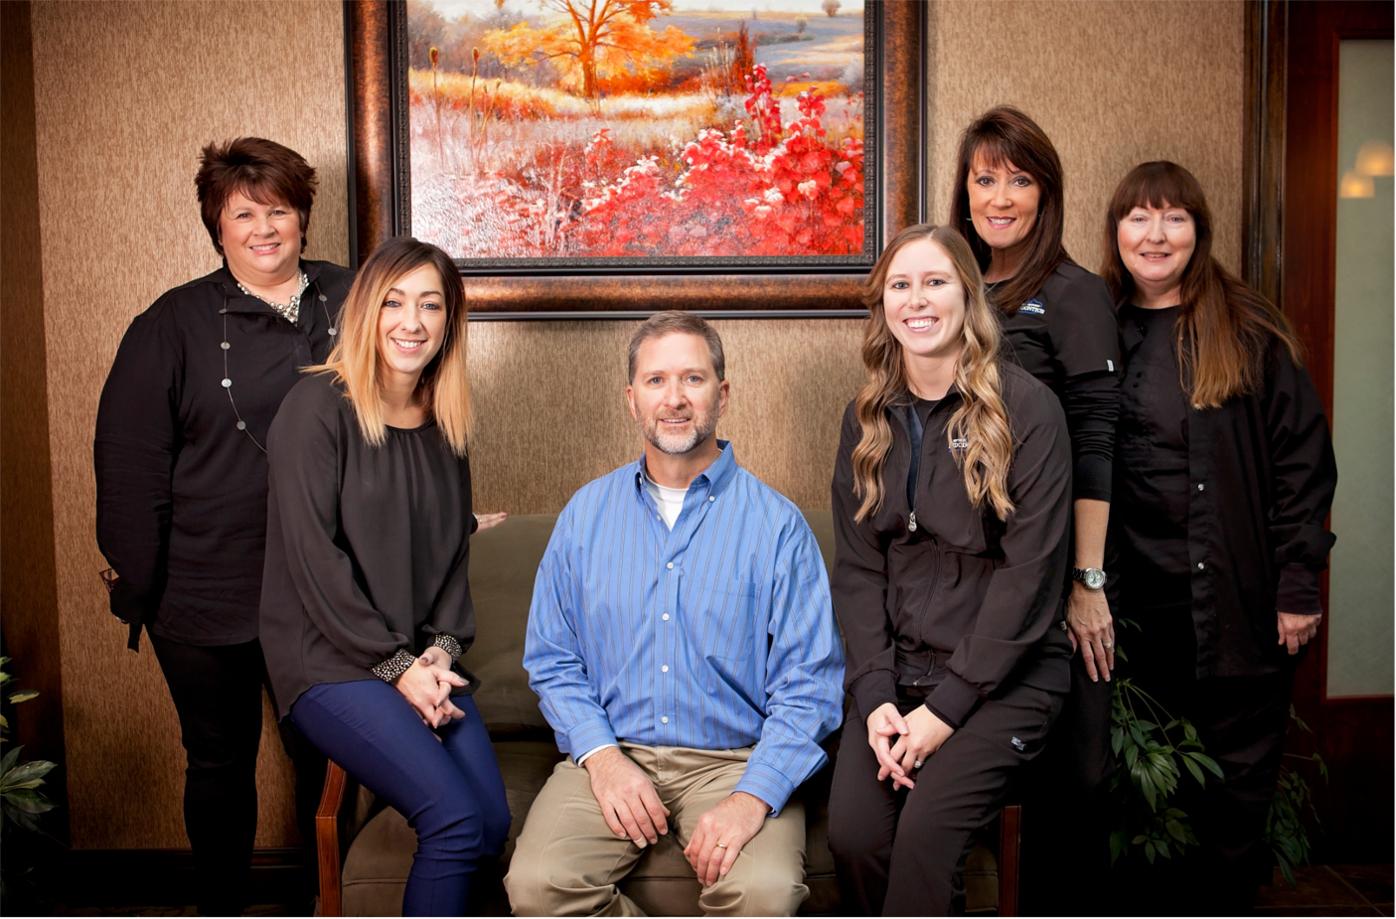 NKY Endodontics Meet us!